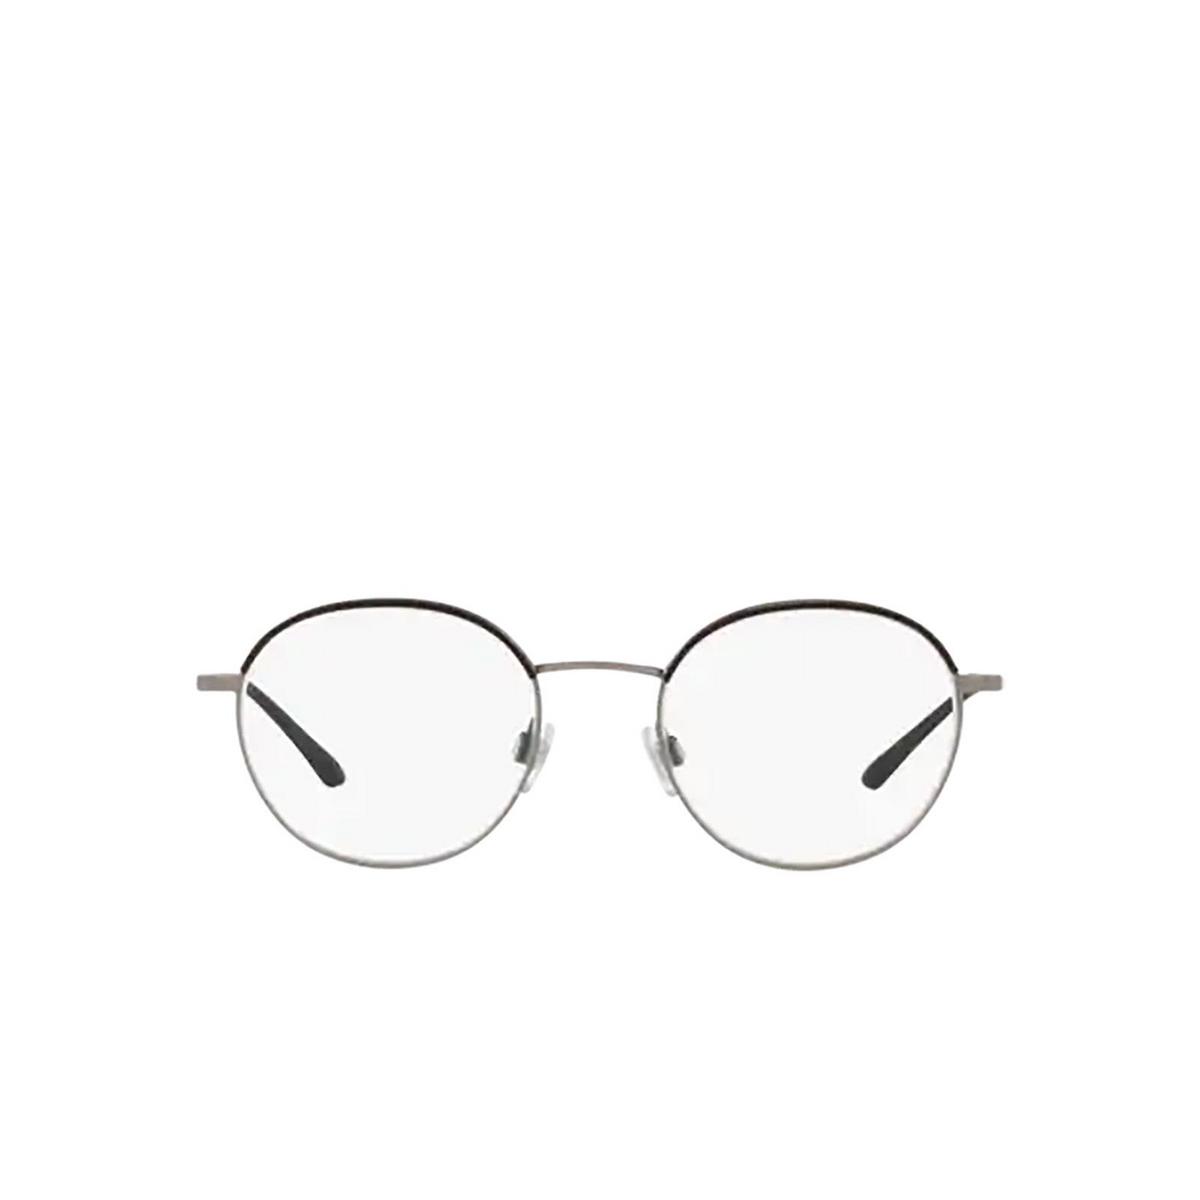 Giorgio Armani® Round Eyeglasses: AR5070J color Matte Gunmetal / Black 3321 - front view.